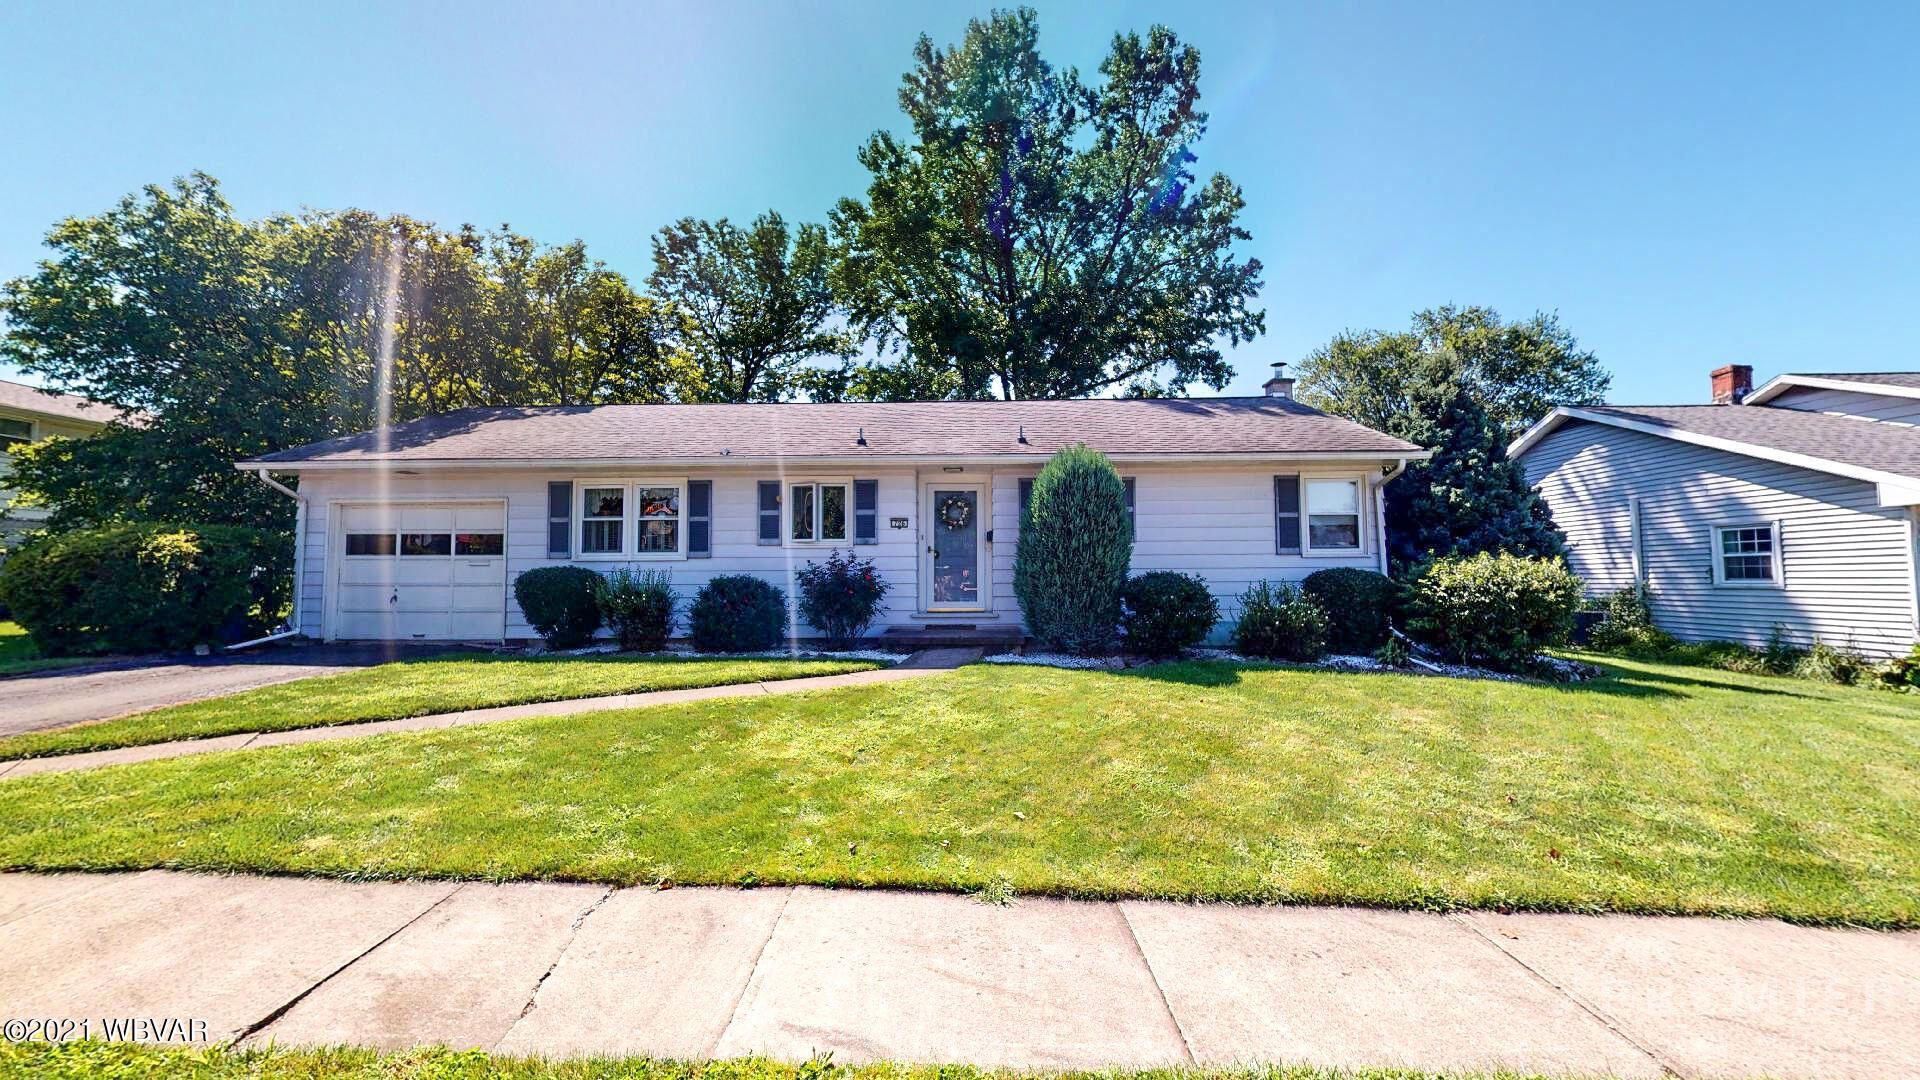 726 GRANDVIEW PLACE, South Williamsport, PA 17702 - #: WB-93440